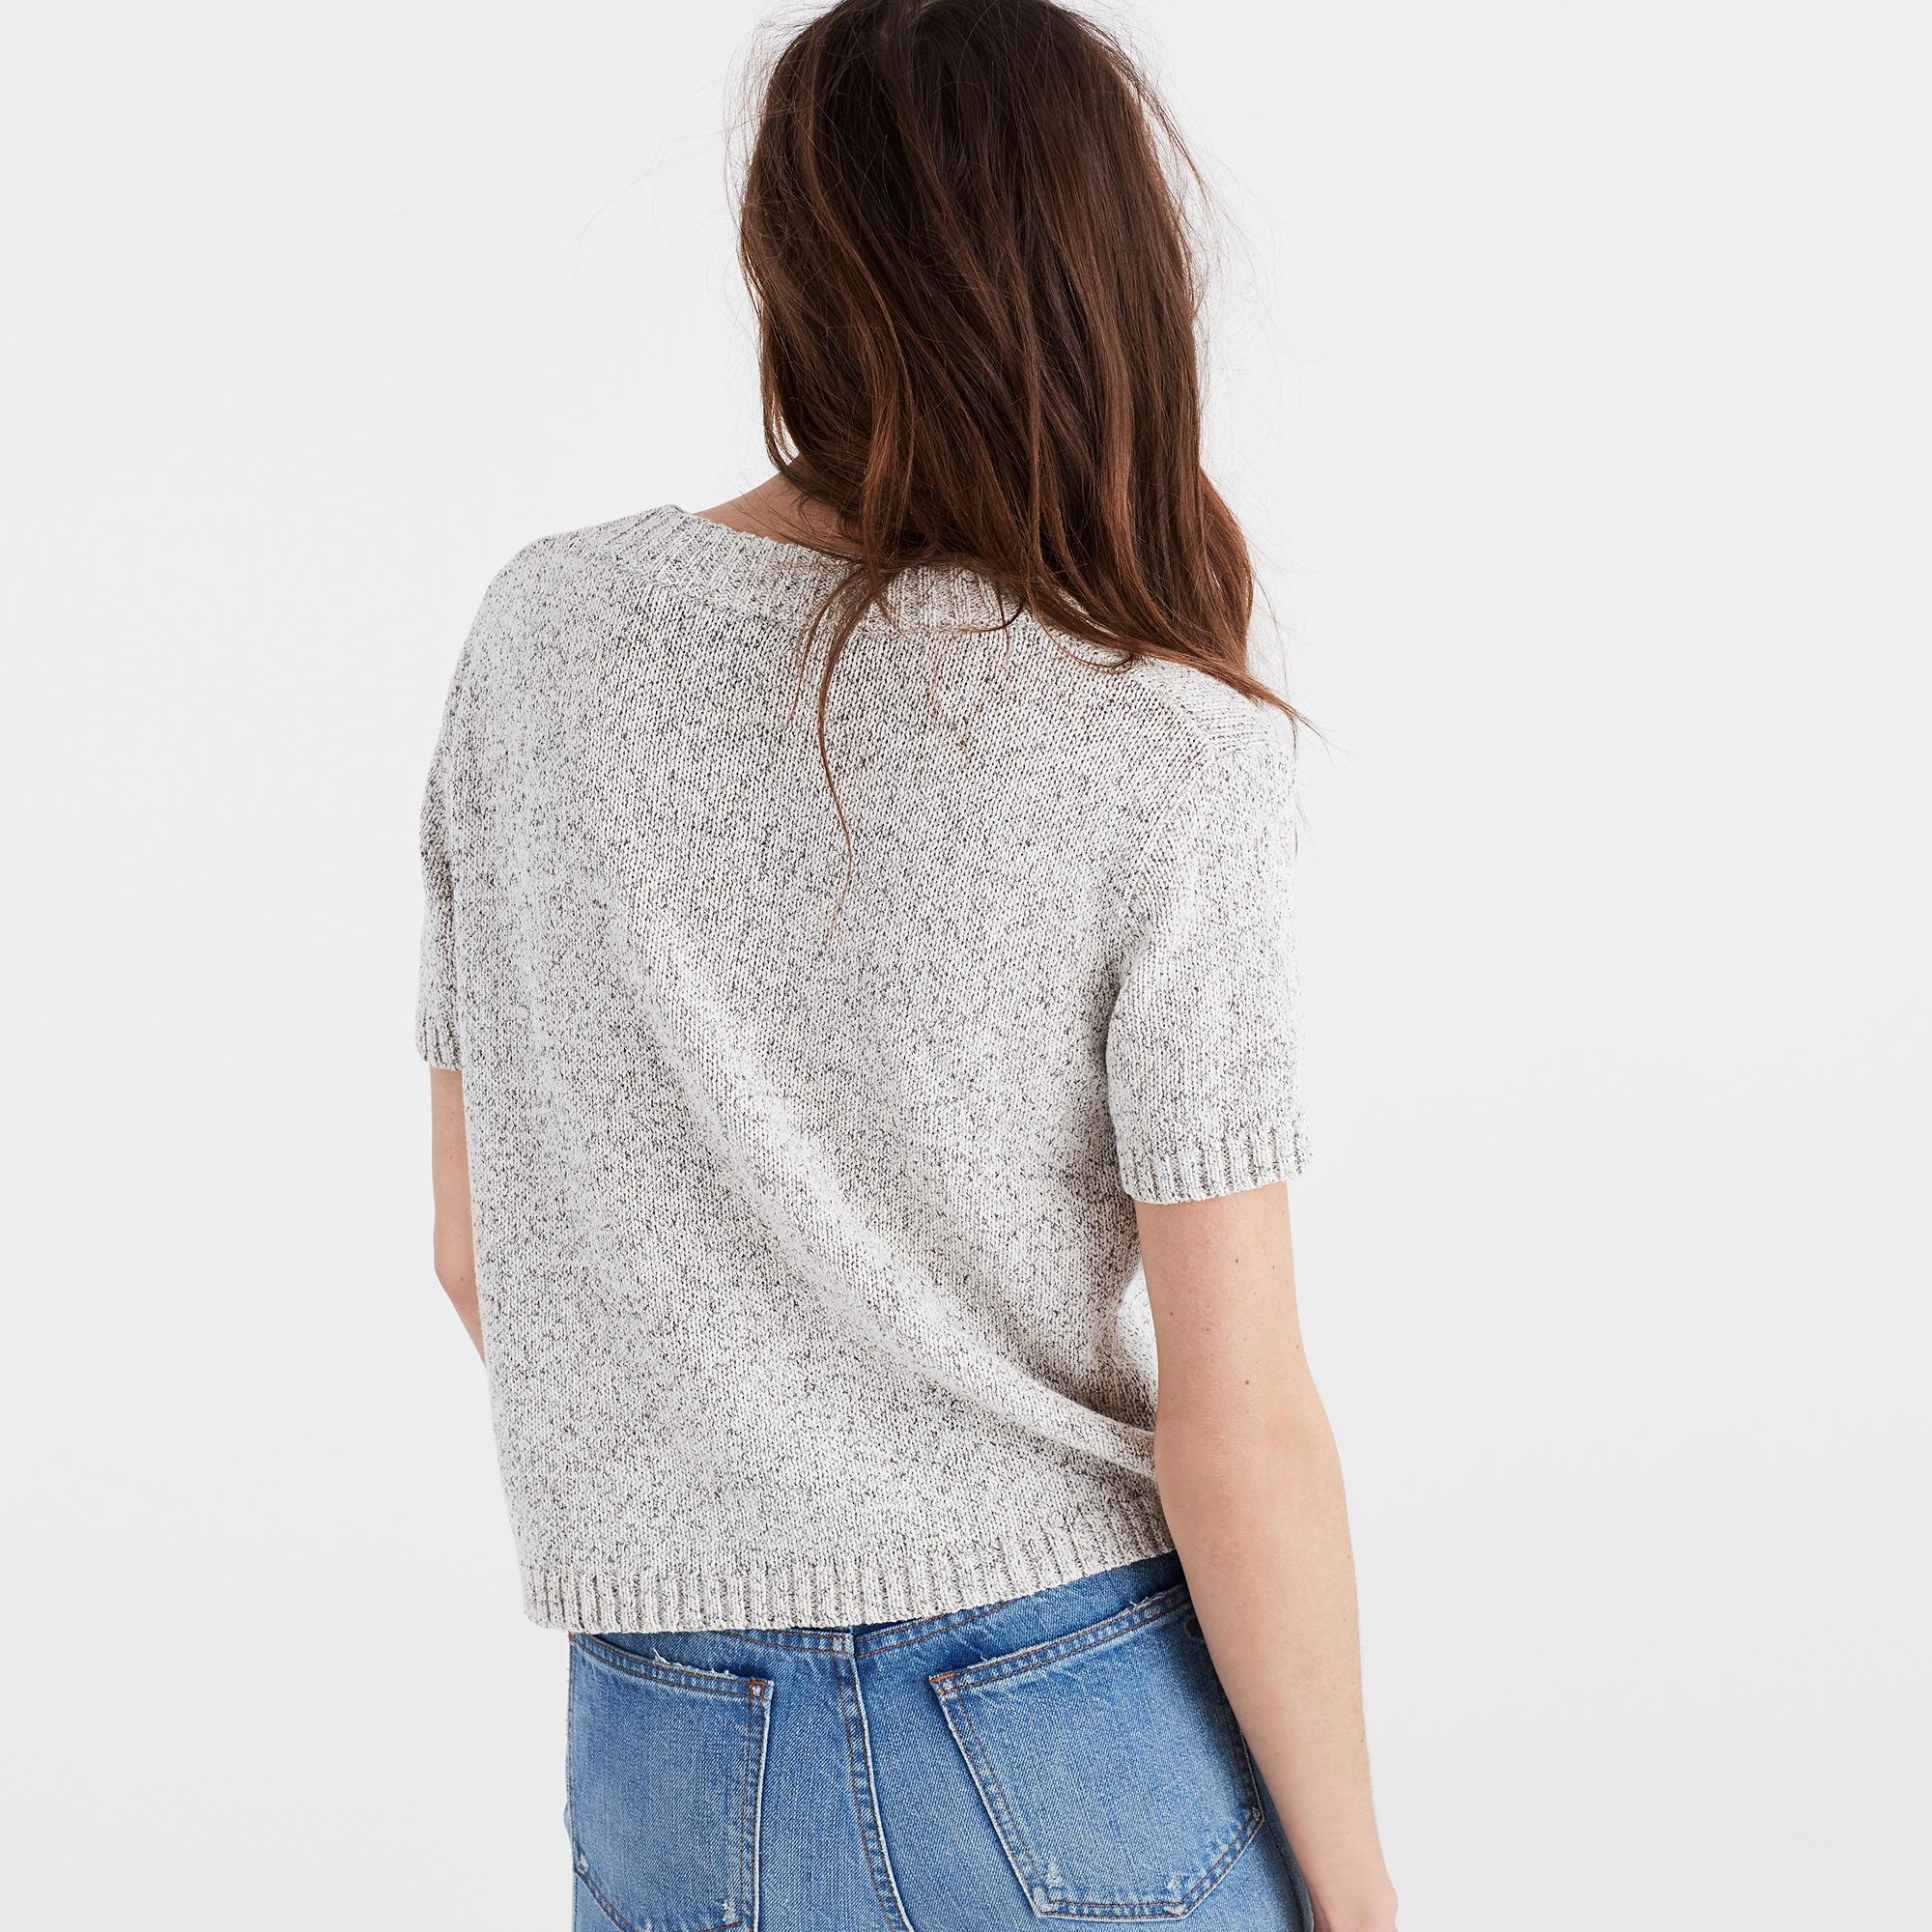 Short-Sleeve Sweater Tee : sleeveless & short sleeve | Madewell